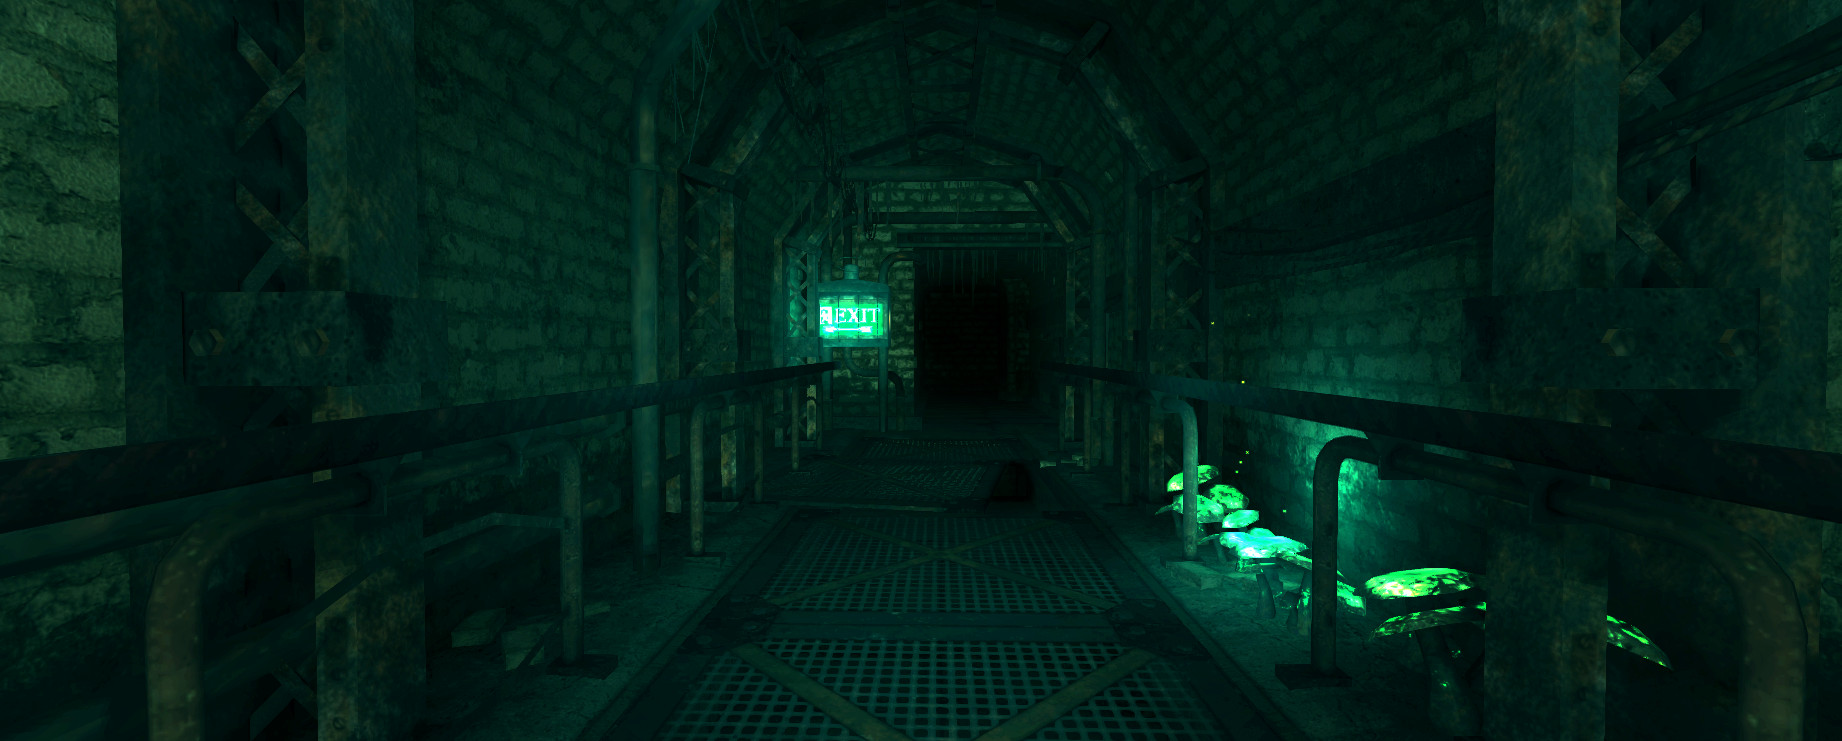 Godot Engine - Onward to the new 3D renderer